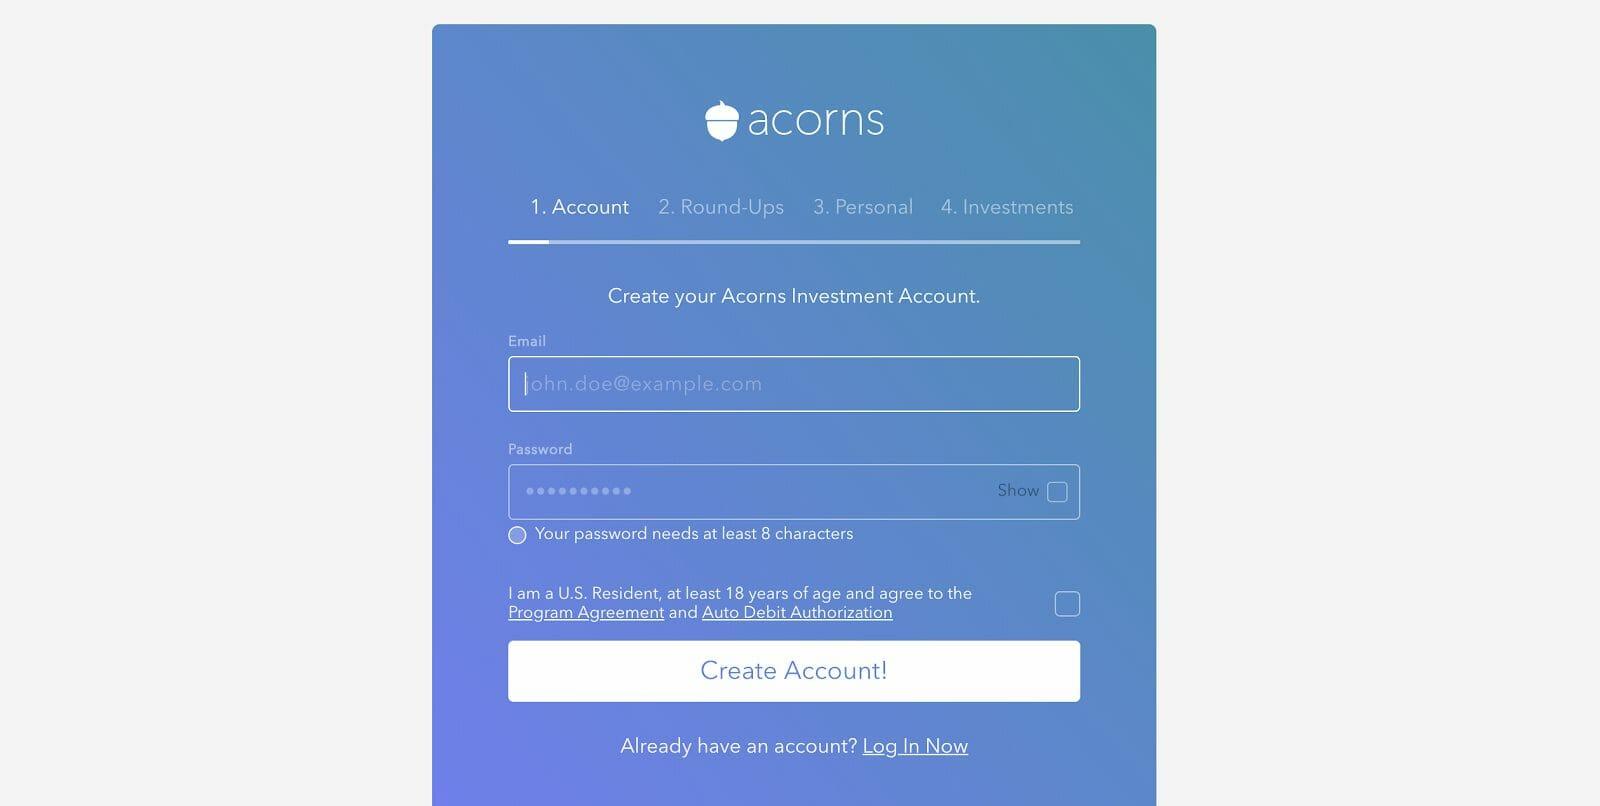 acorns-review